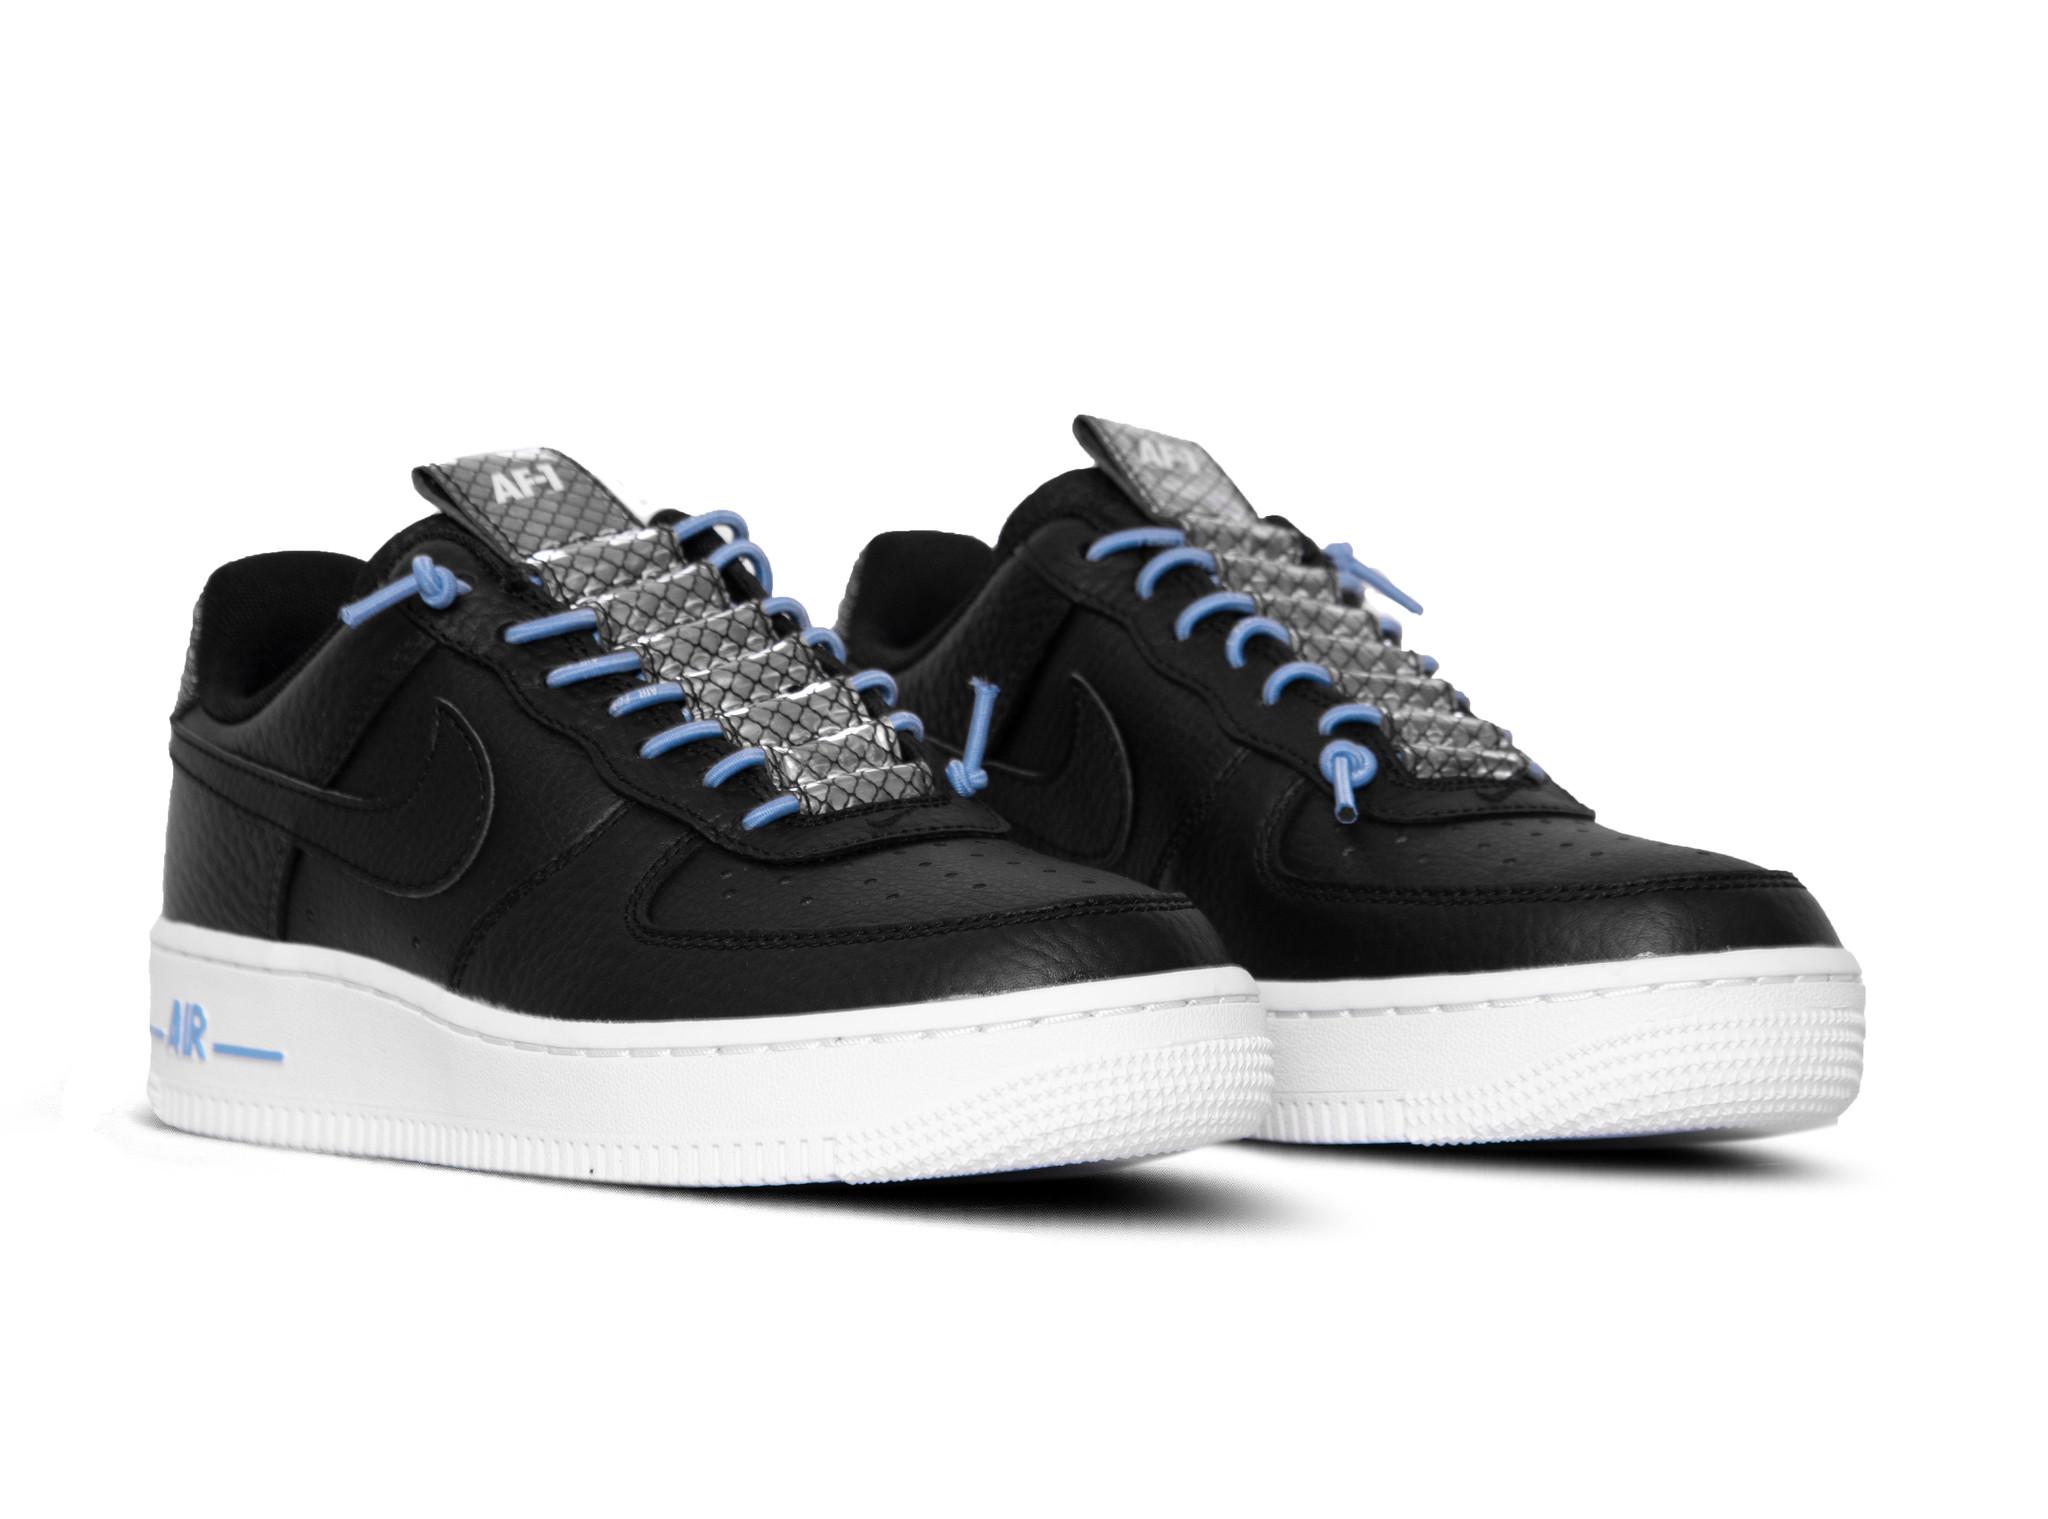 Nike Air Force 1 '07 LUX Black Light Blue White 898889 015